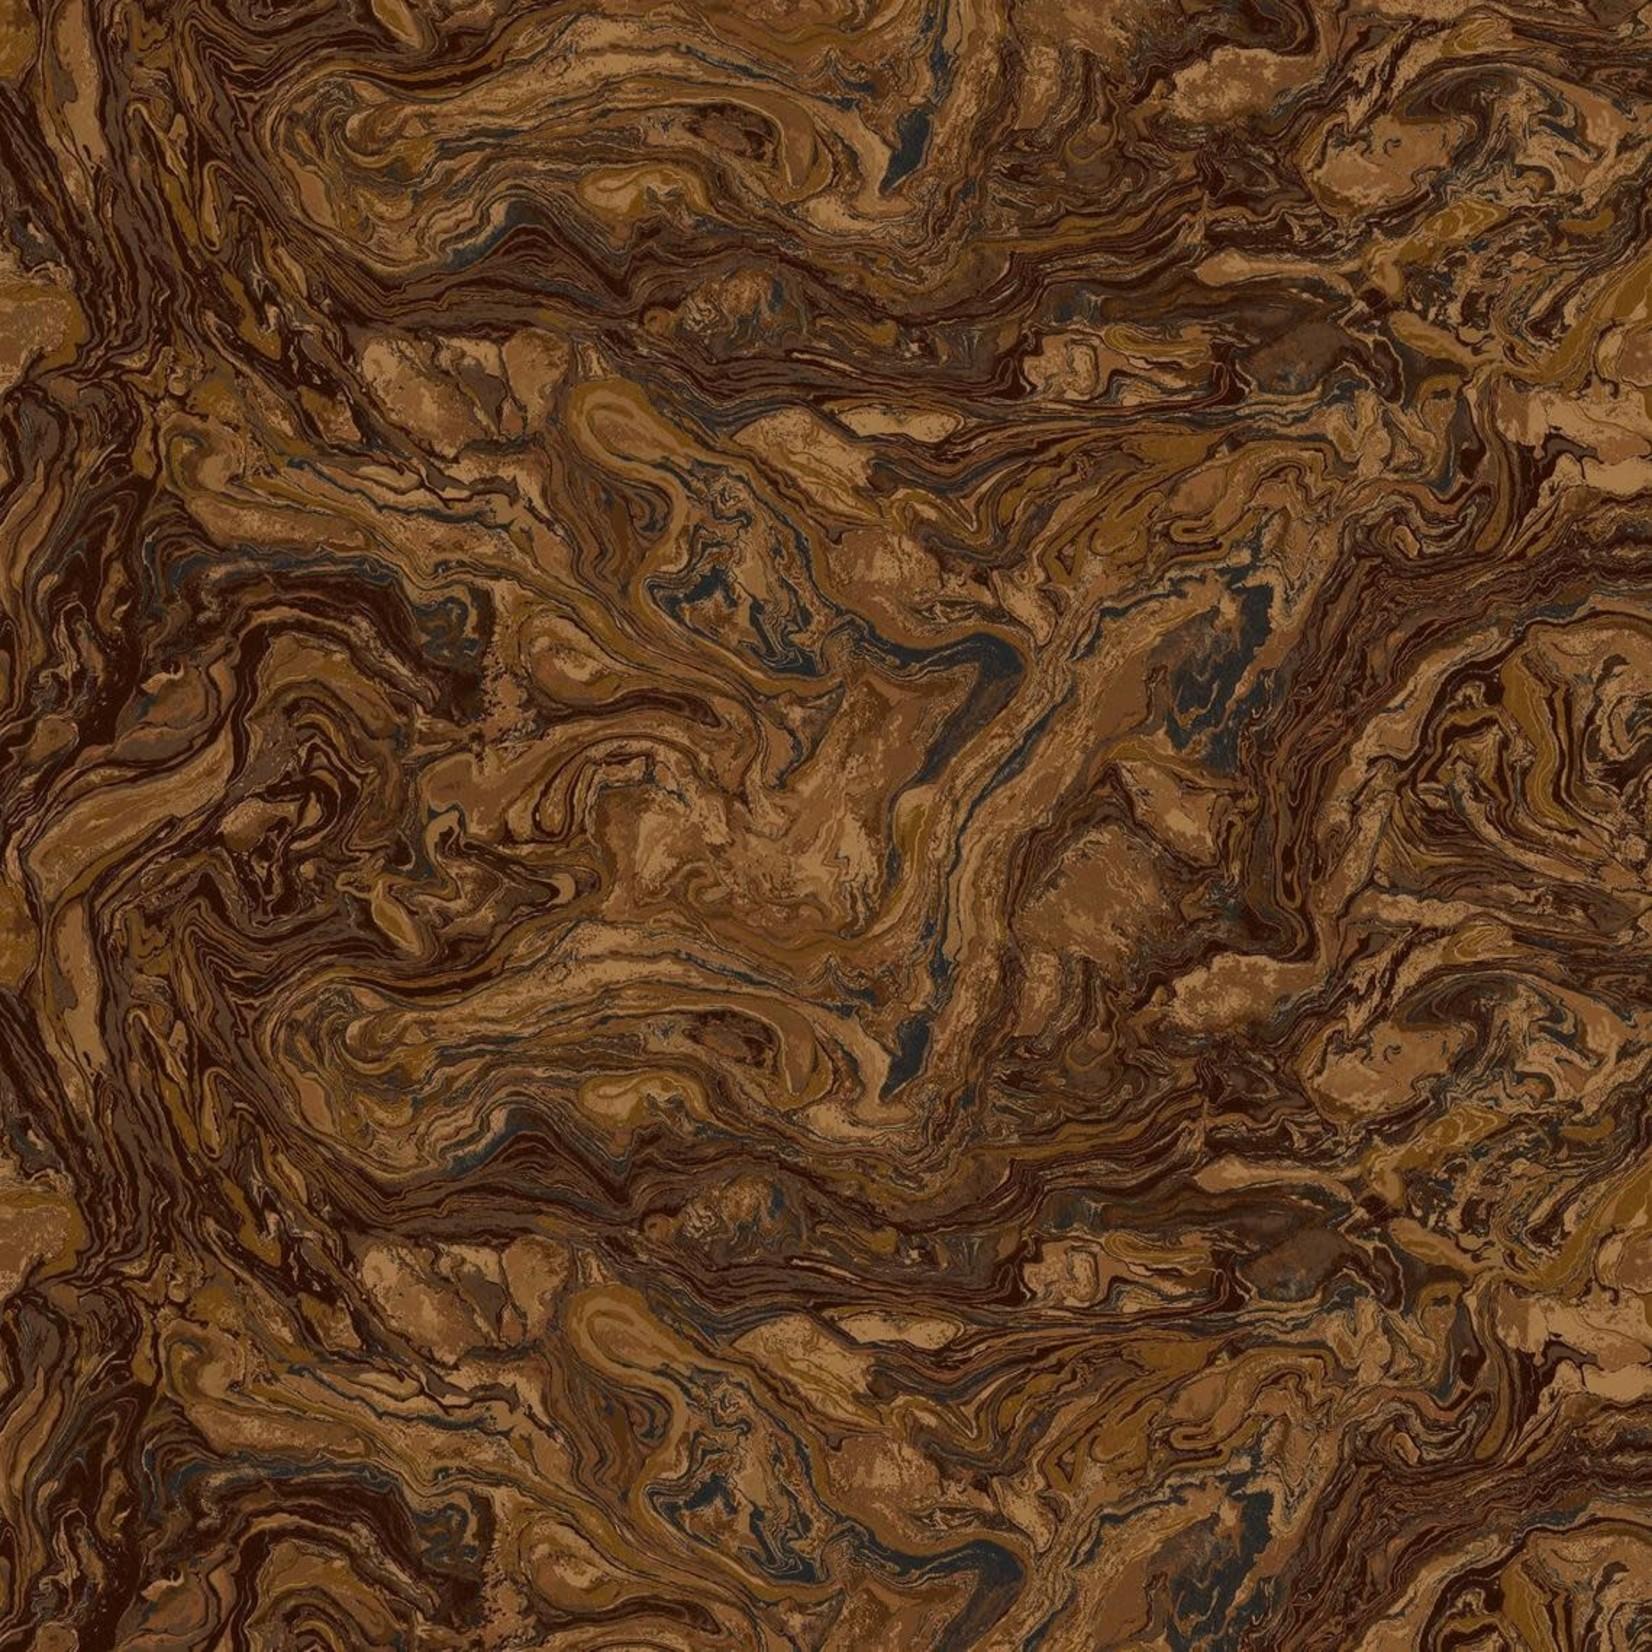 Fabri-Quilt Italian Marble - Tiger Eye